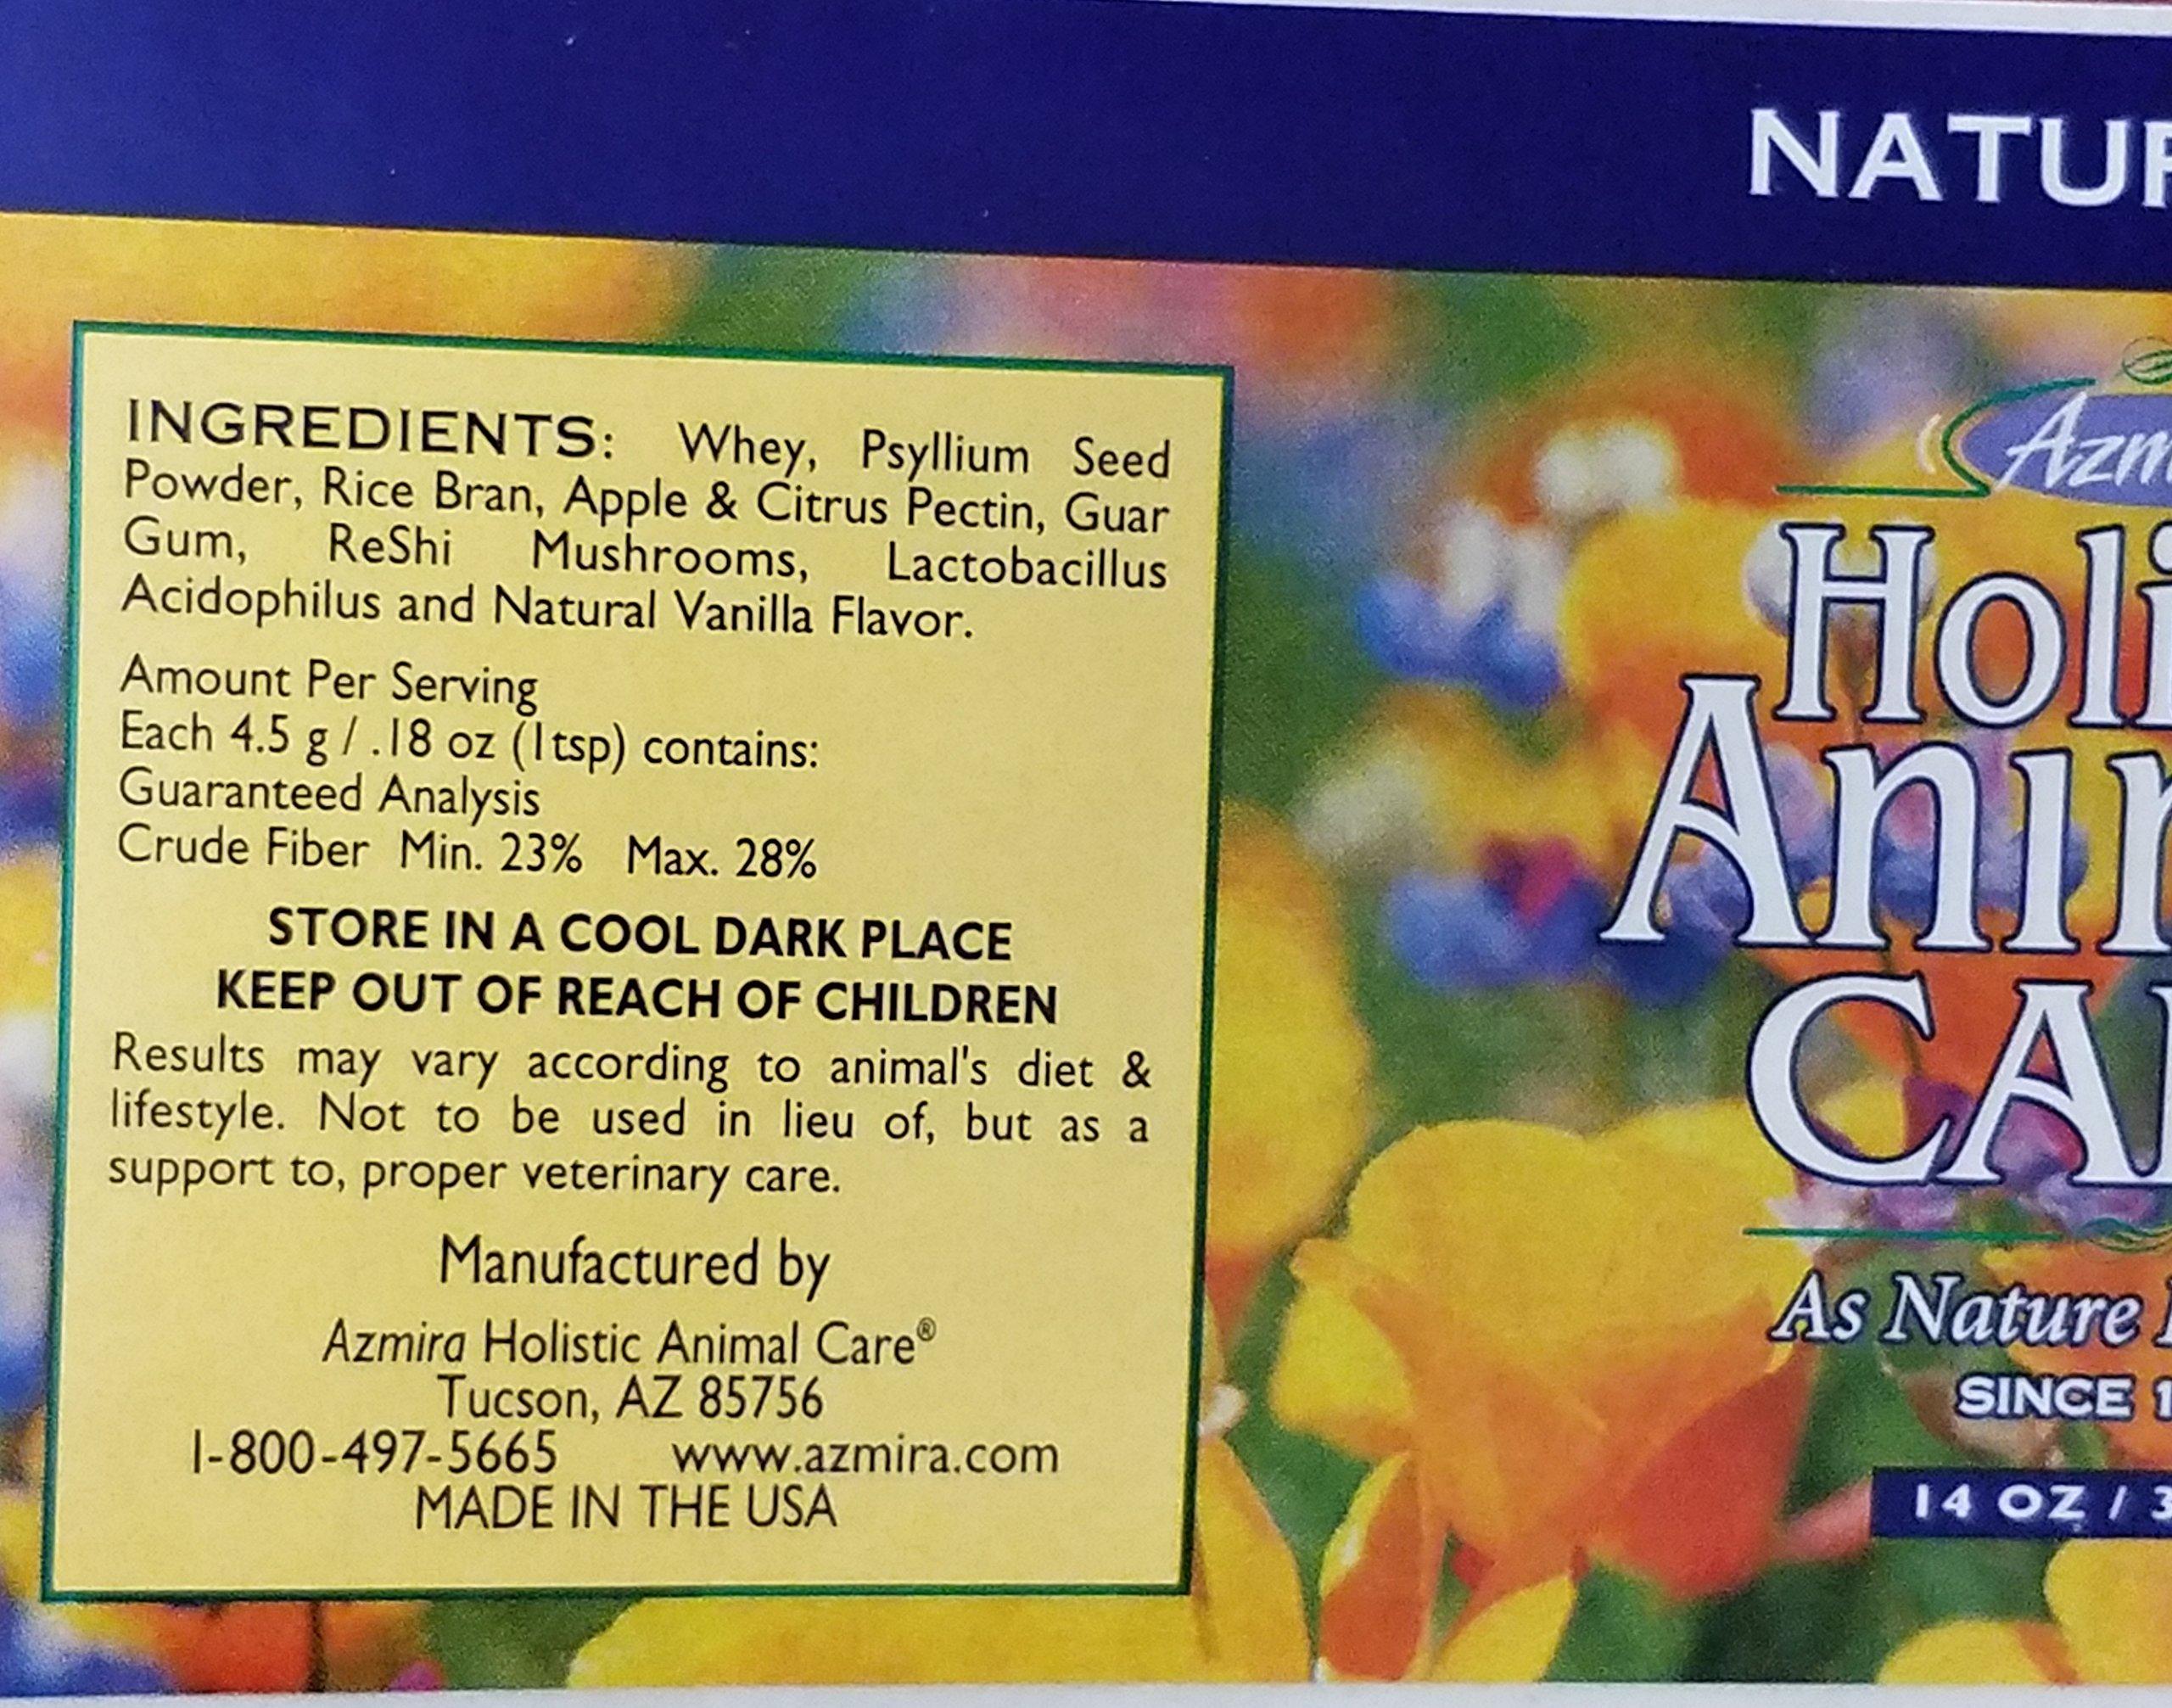 Naturfiber Holistic Animal Care,4 Oz